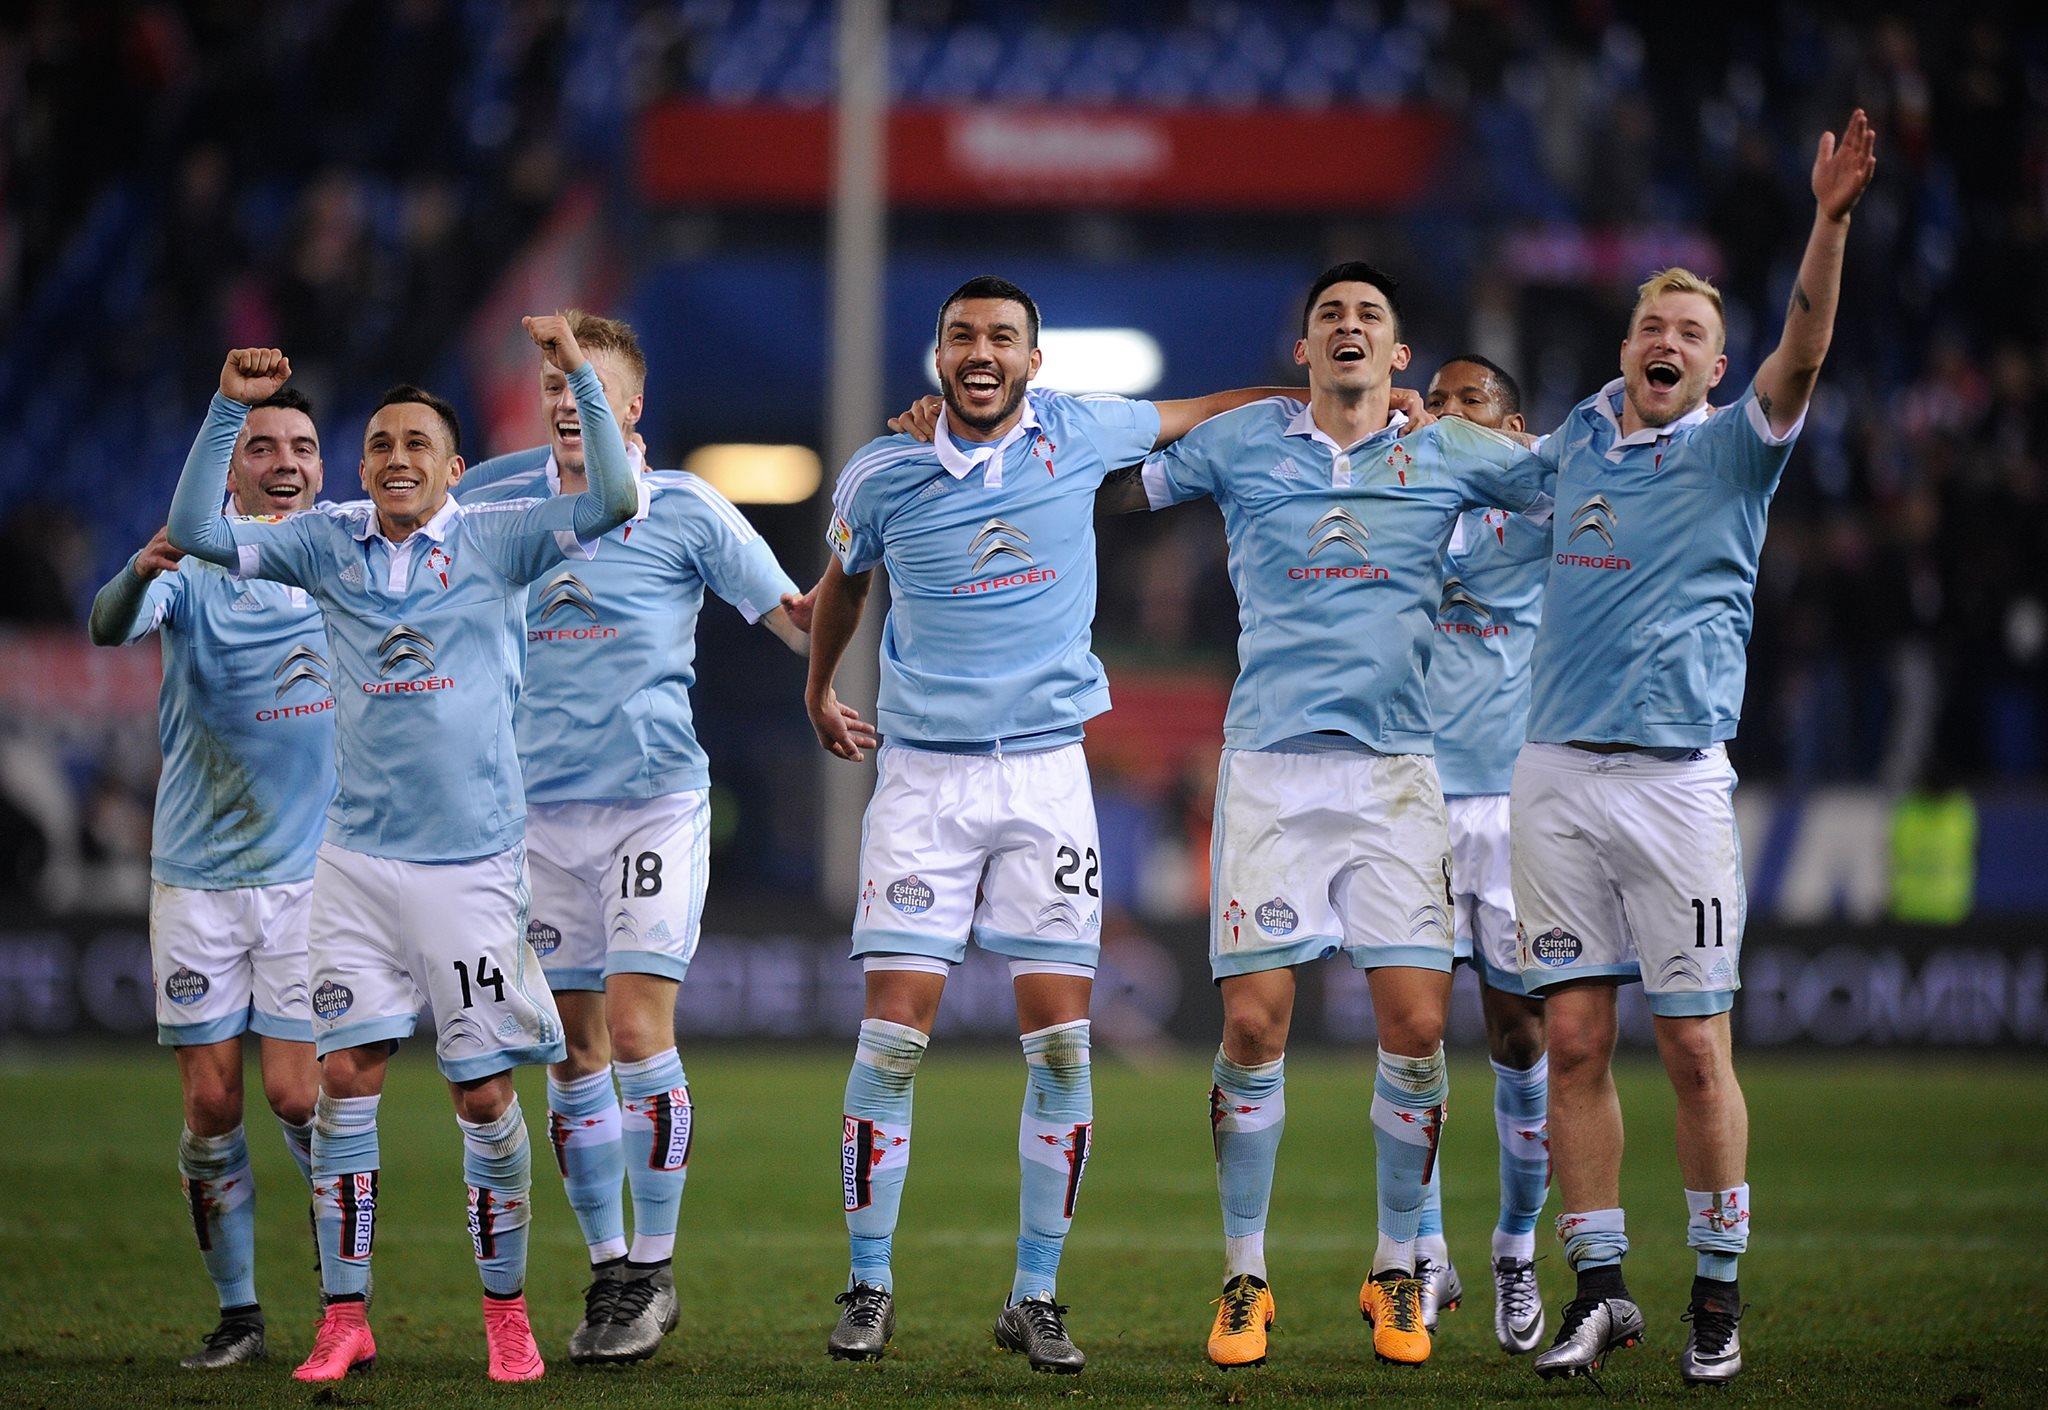 Will Celta de Vigo be able to win their first league match next time out?